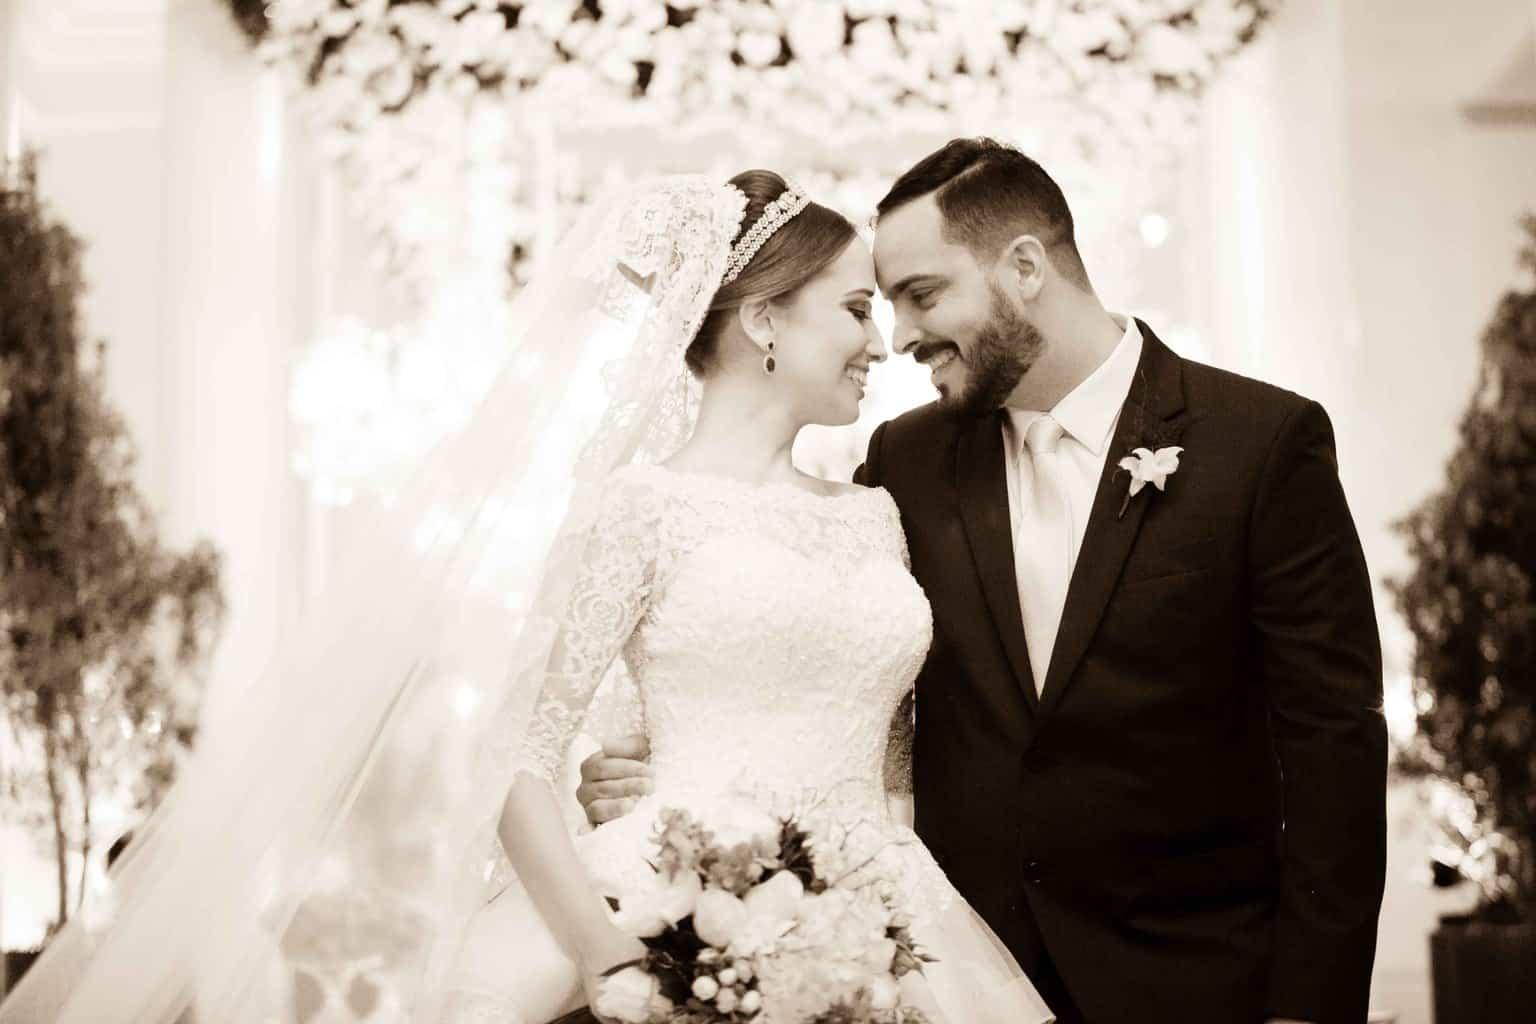 Casamento-Clássico-Casamento-tradicional-Copacabana-Palace-Monica-Roias-Poses-Casal-Ribas-Foto-e-Vídeo-Tuanny-e-Bernardo-CaseMe-2